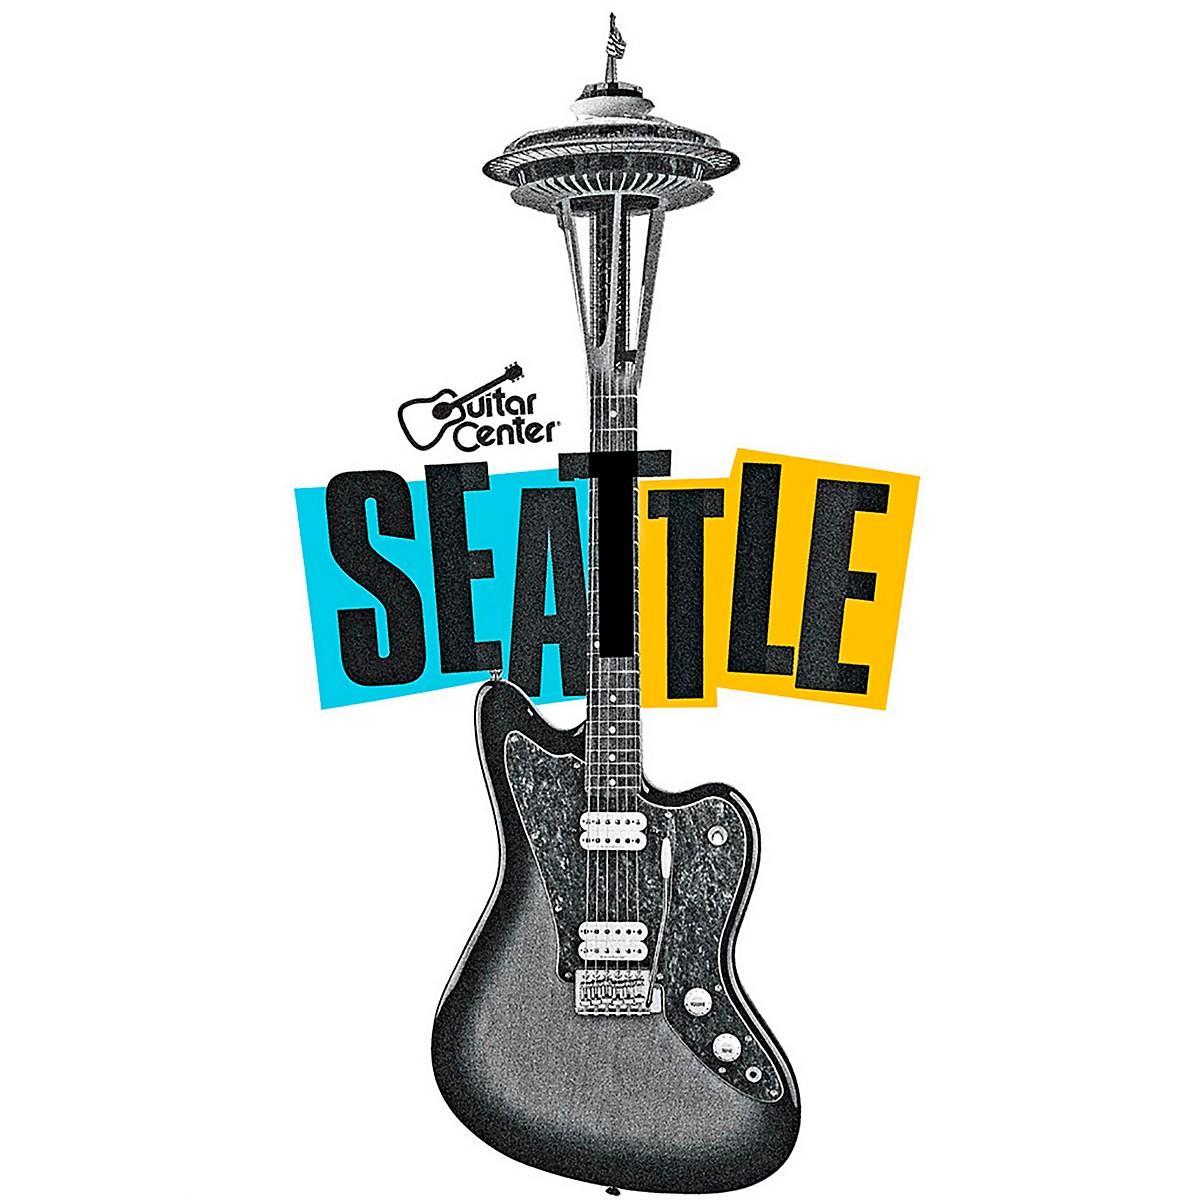 Guitar Center Seattle Guitar Needle Graphic Magnet